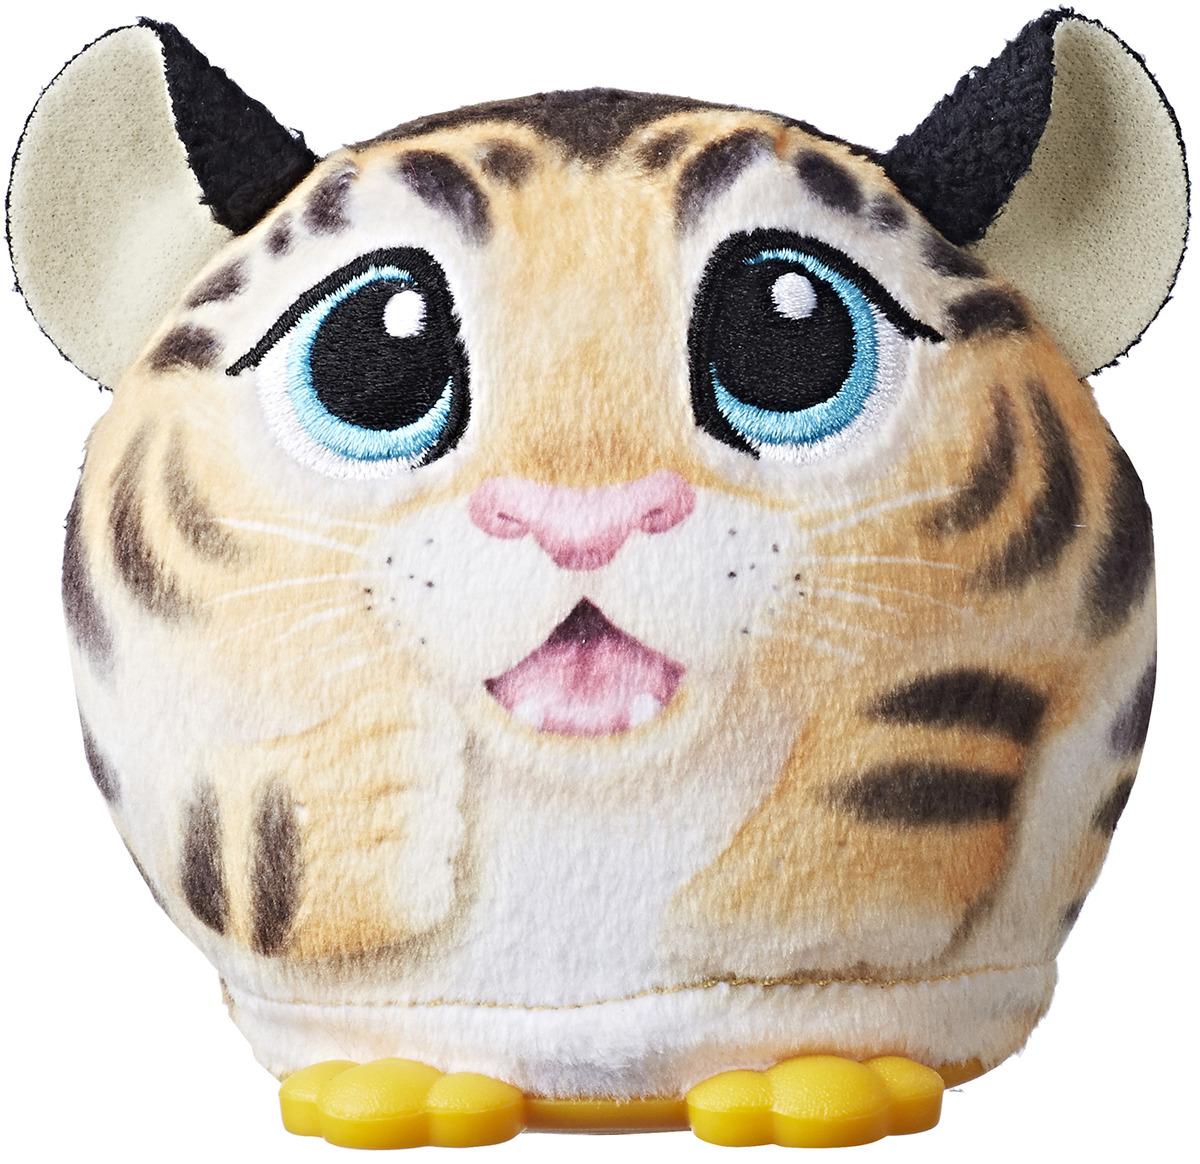 цена на Интерактивная игрушка FurReal Friends Плюшевый друг Тигренок, E0783_E1095